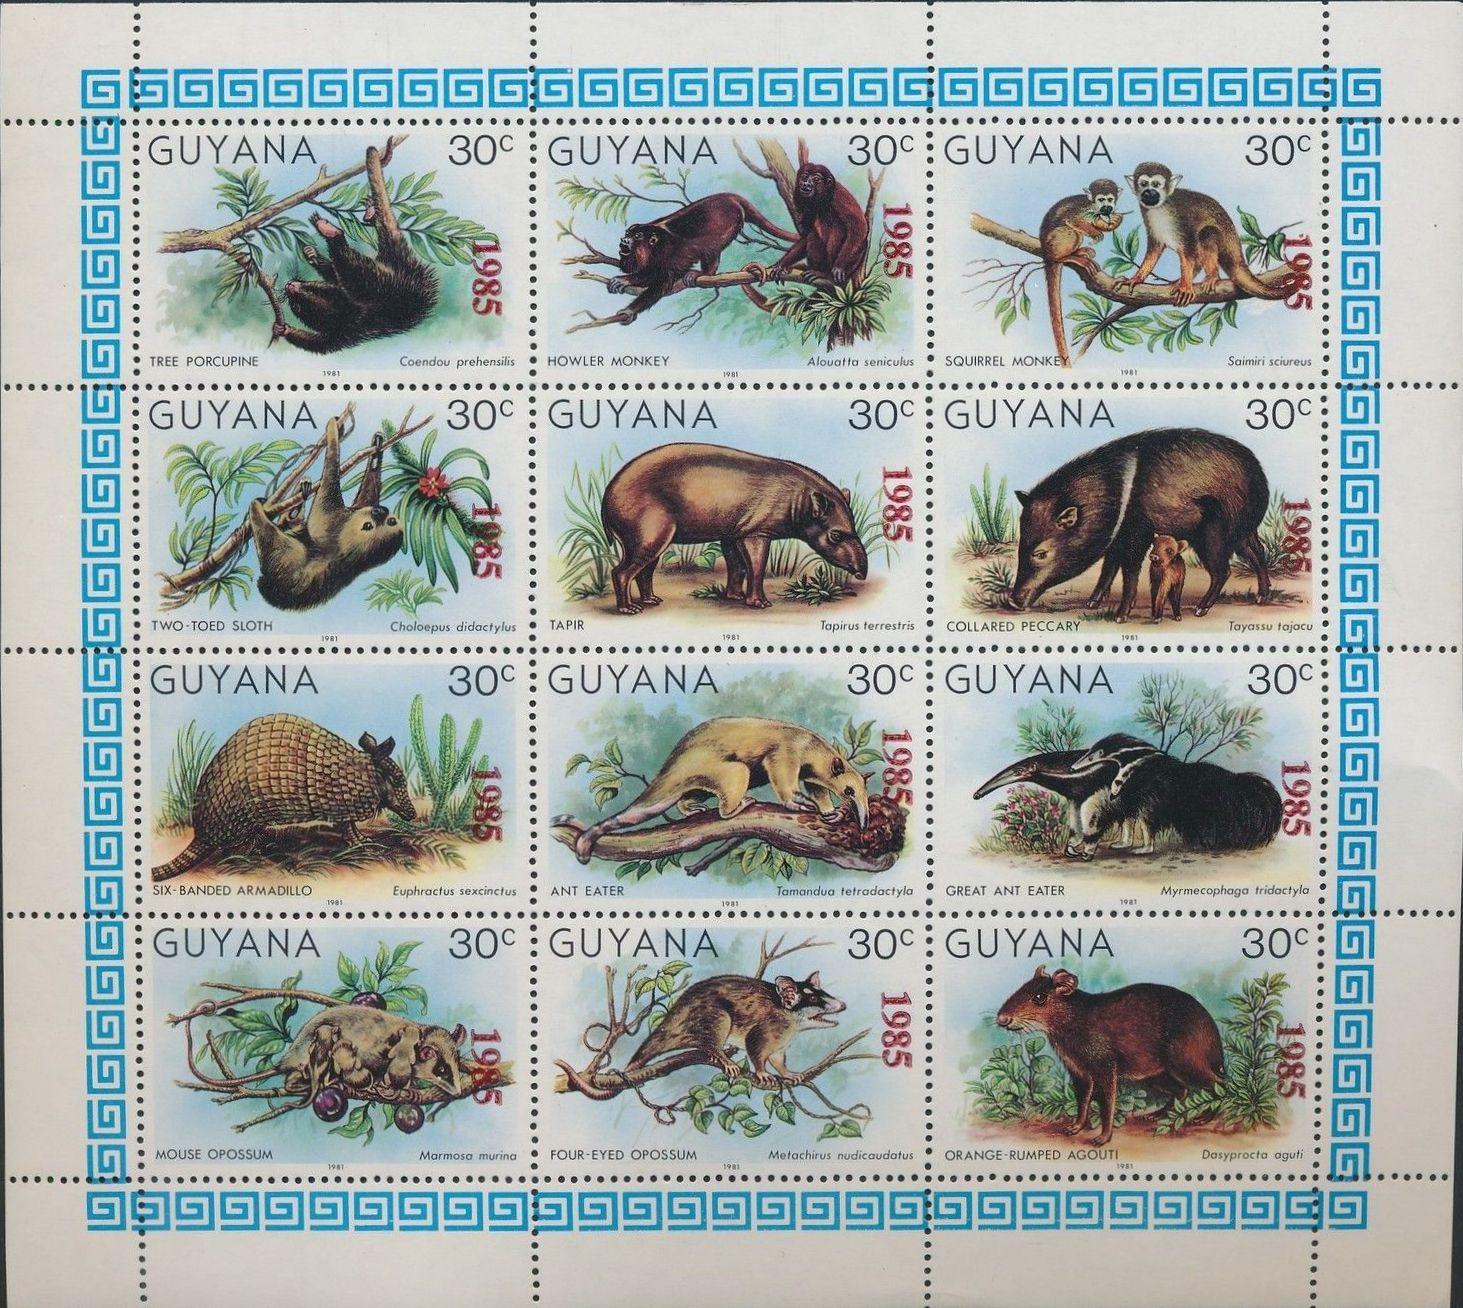 Guyana 1985 Wildlife (Overprinted 1985)